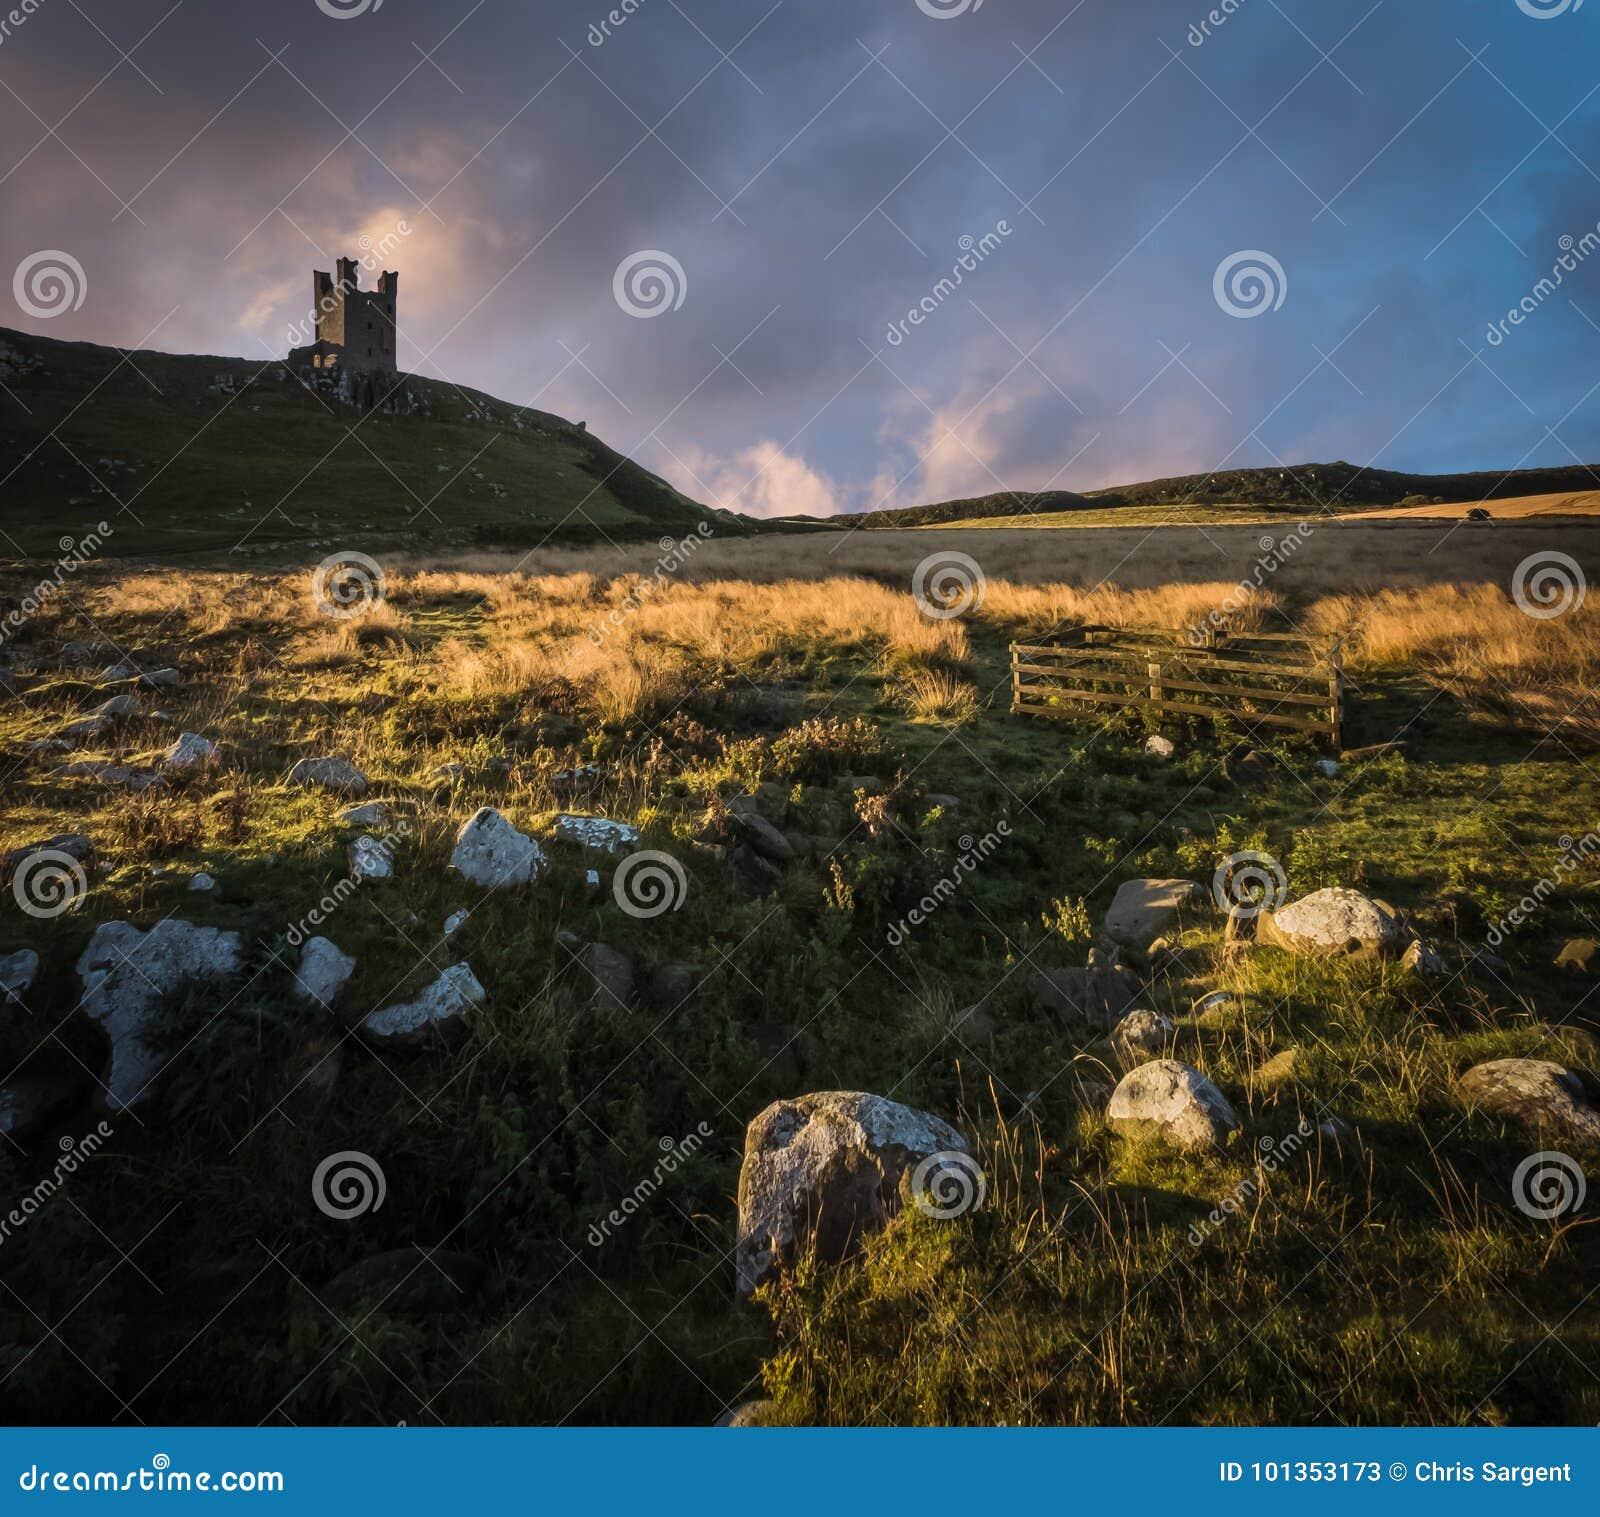 Dunstanburghkasteel in Northumberland